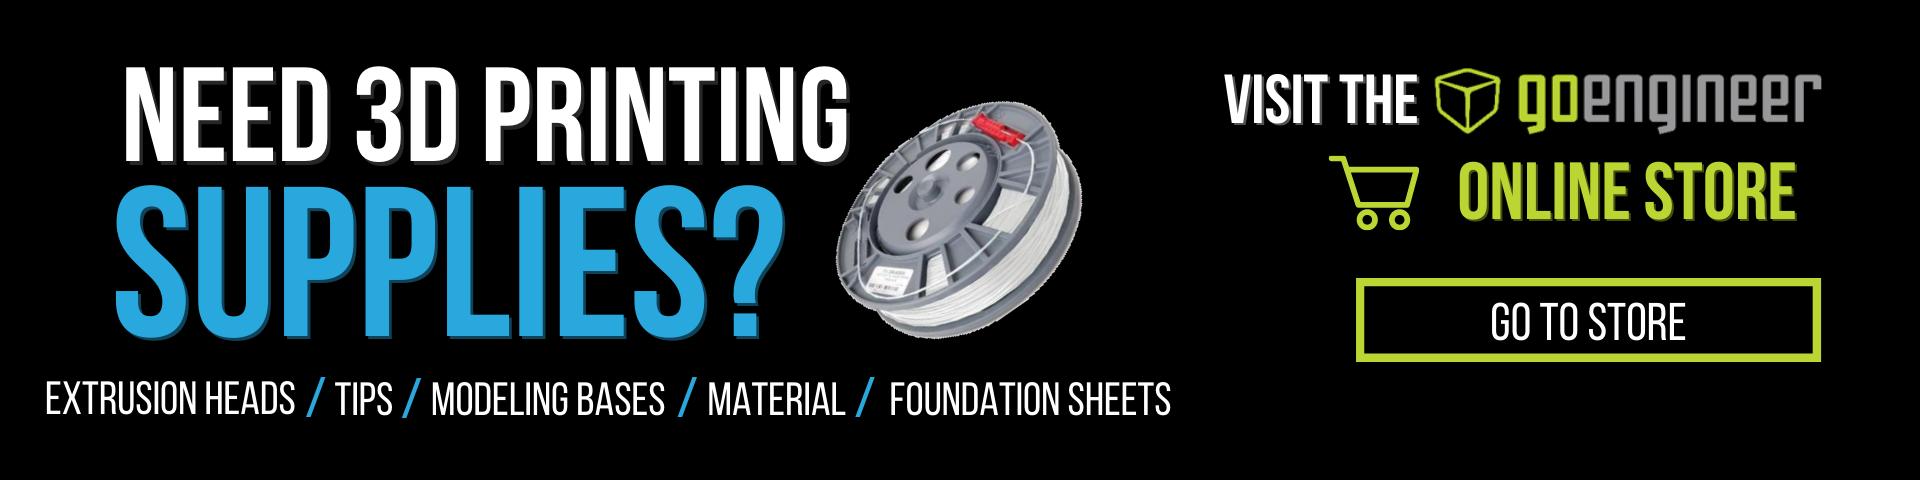 Visit GoEngineer Online Store for 3D Printing Supplies